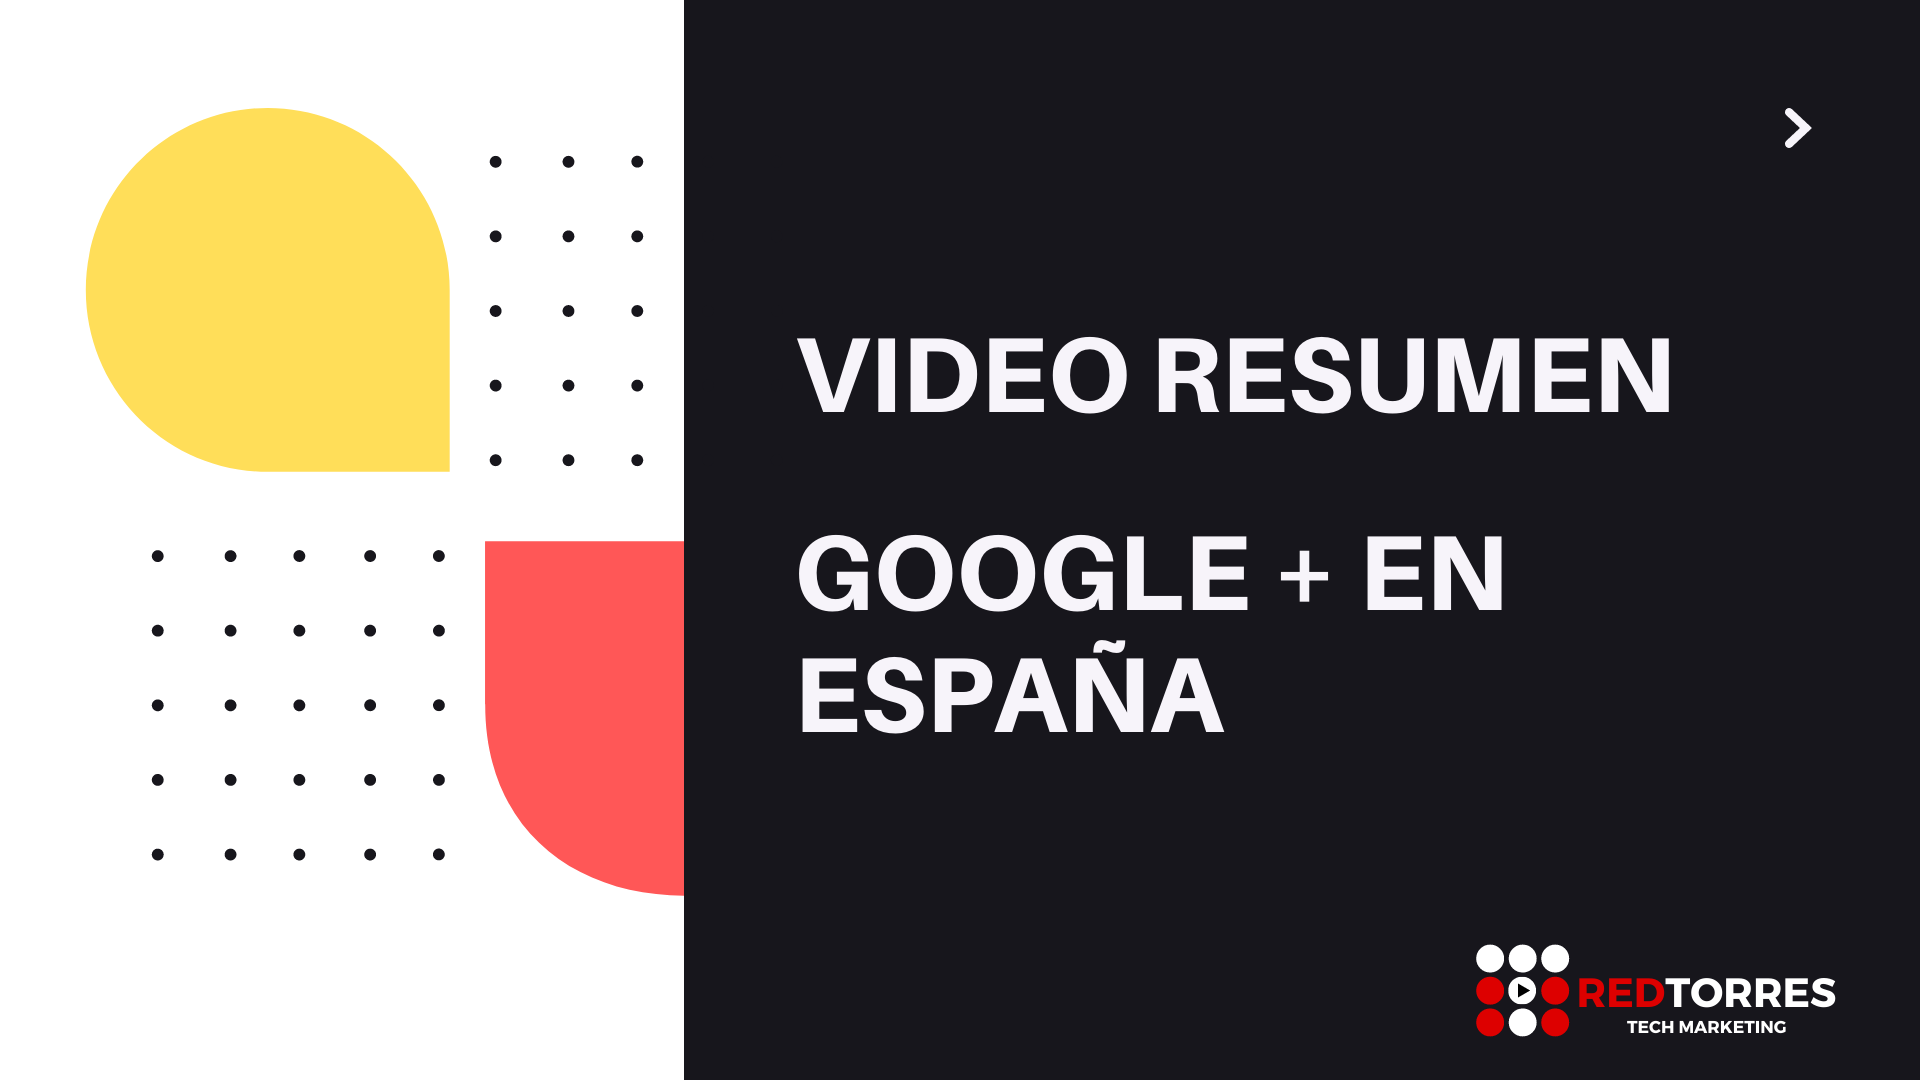 Video Resumen Google en España